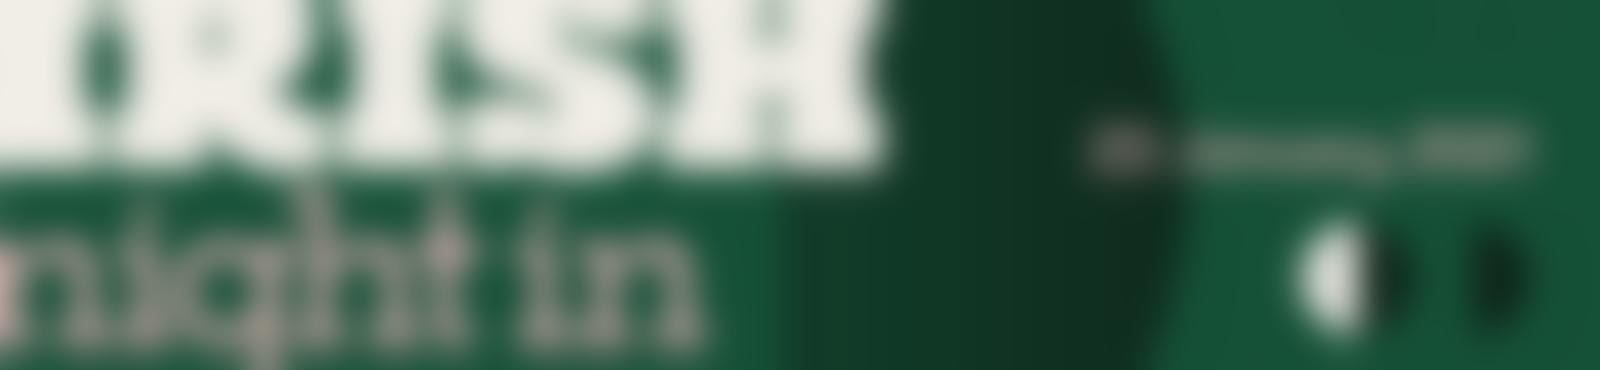 Blurred 700a1b8f 7ce1 47cd 9c51 3c084033fd82